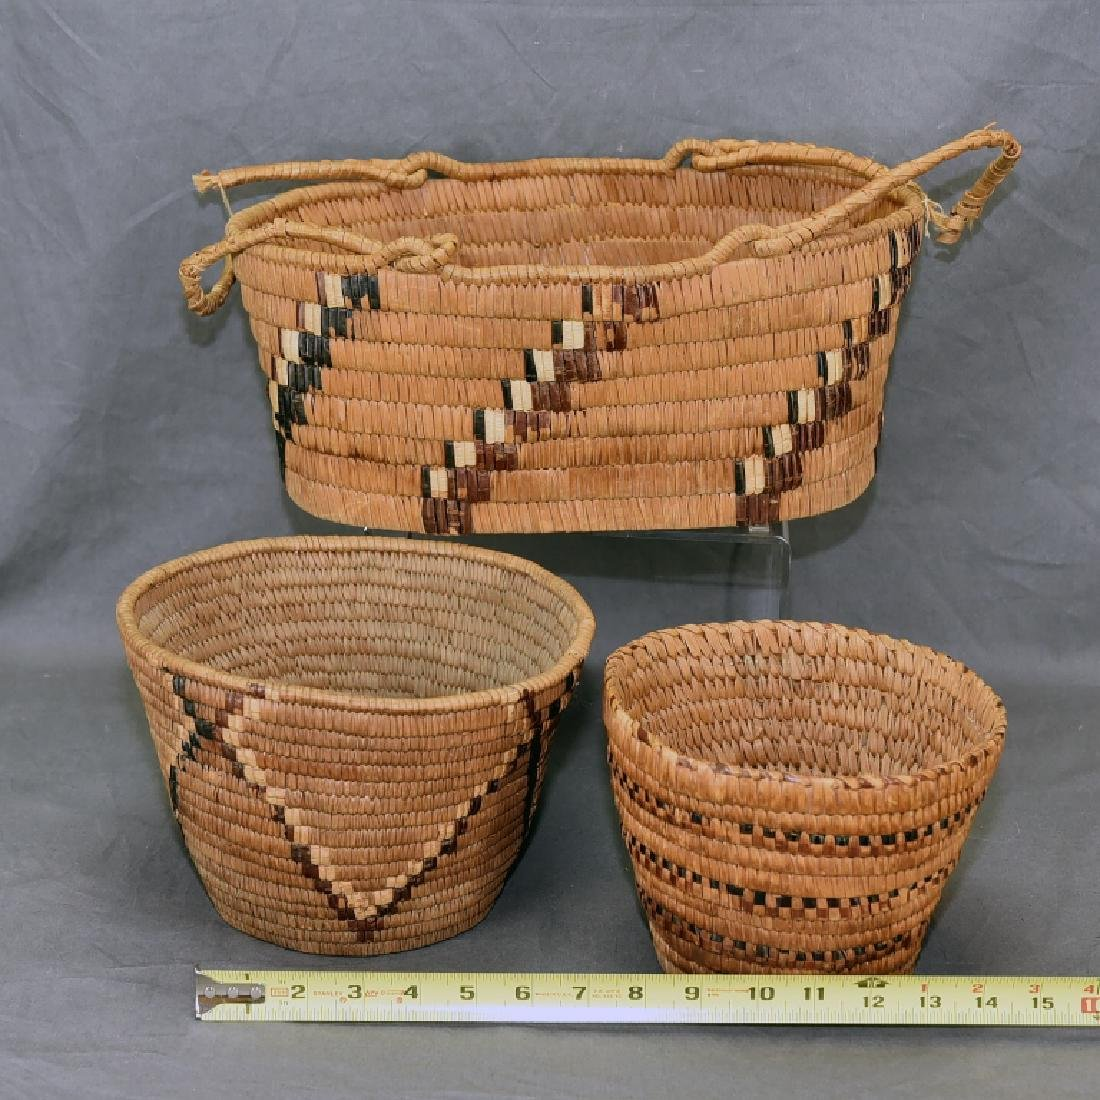 3 Thompson River Native American Baskets - 2